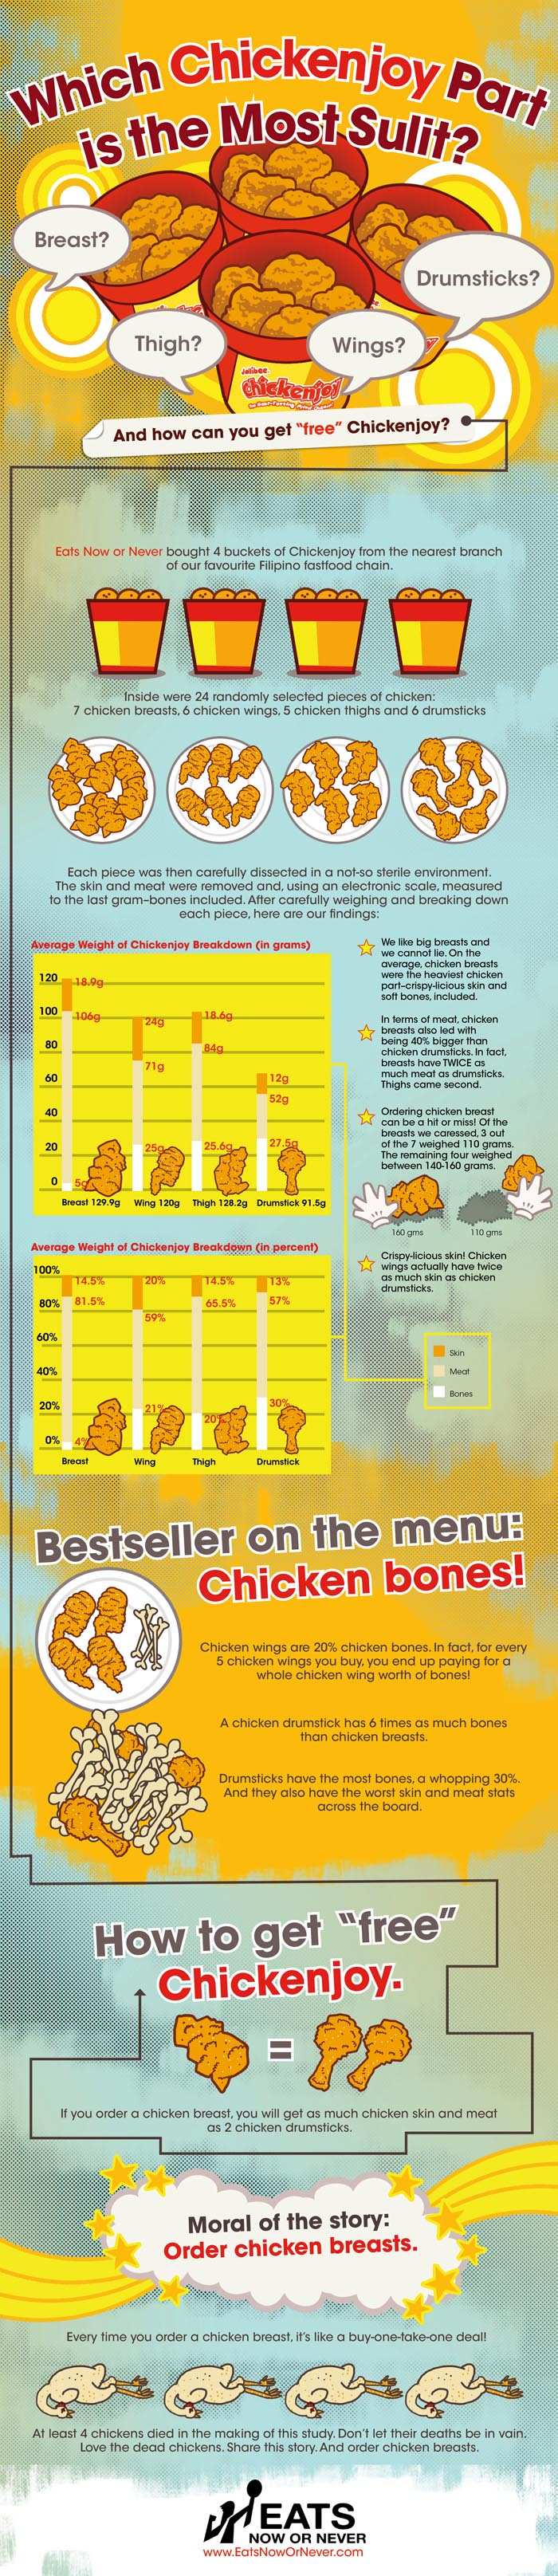 eatsnowornever_chickenjoy_infographic